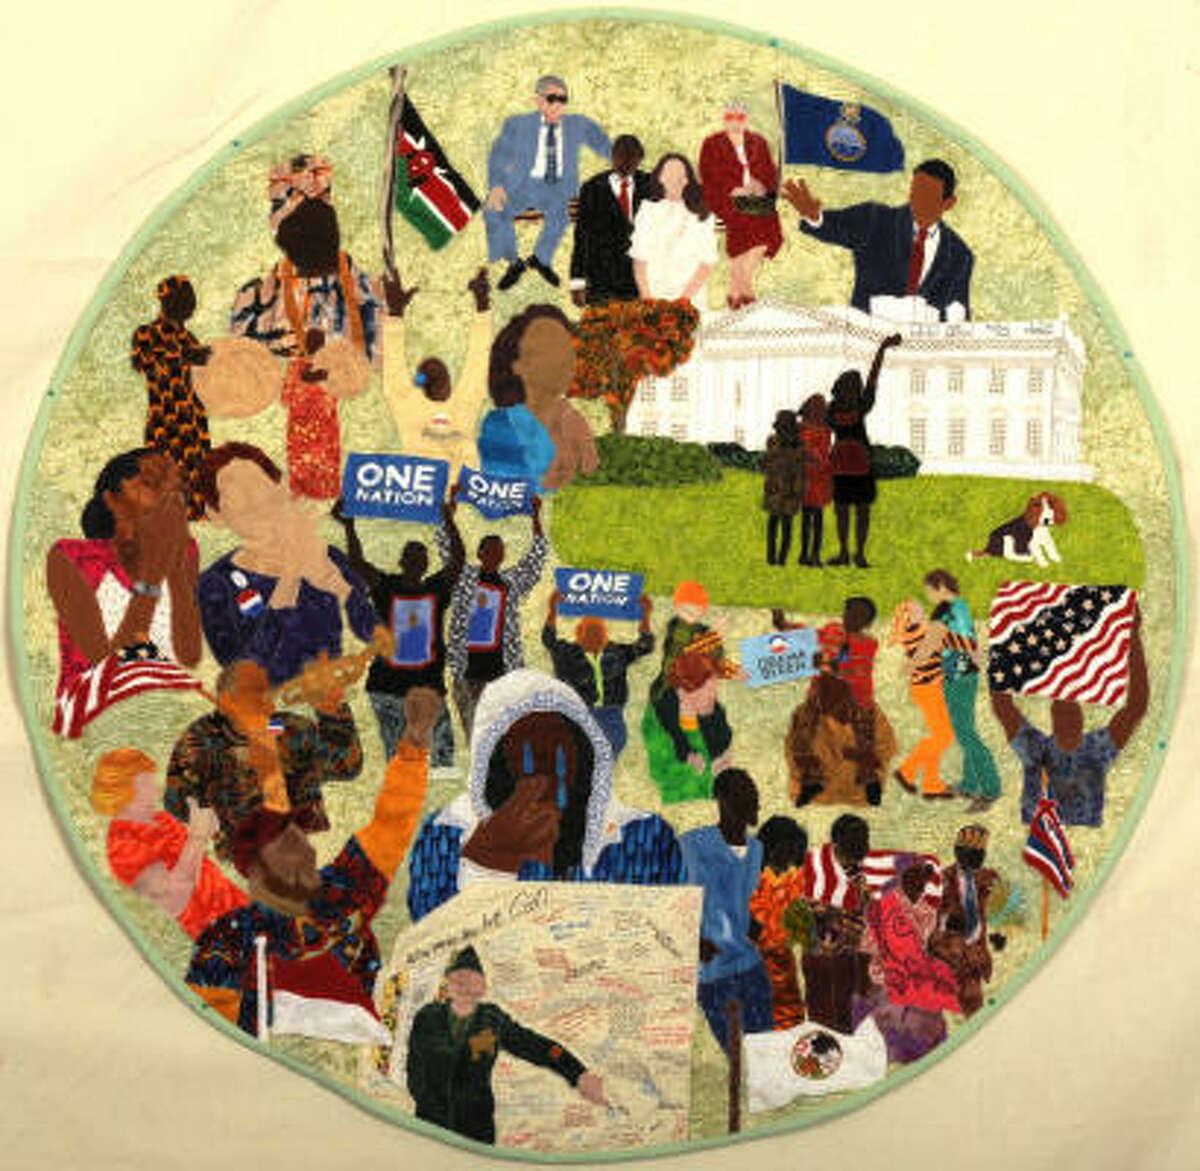 From Kenya to Kansas by Denise Campbell of San Luis Obispo, Calif.